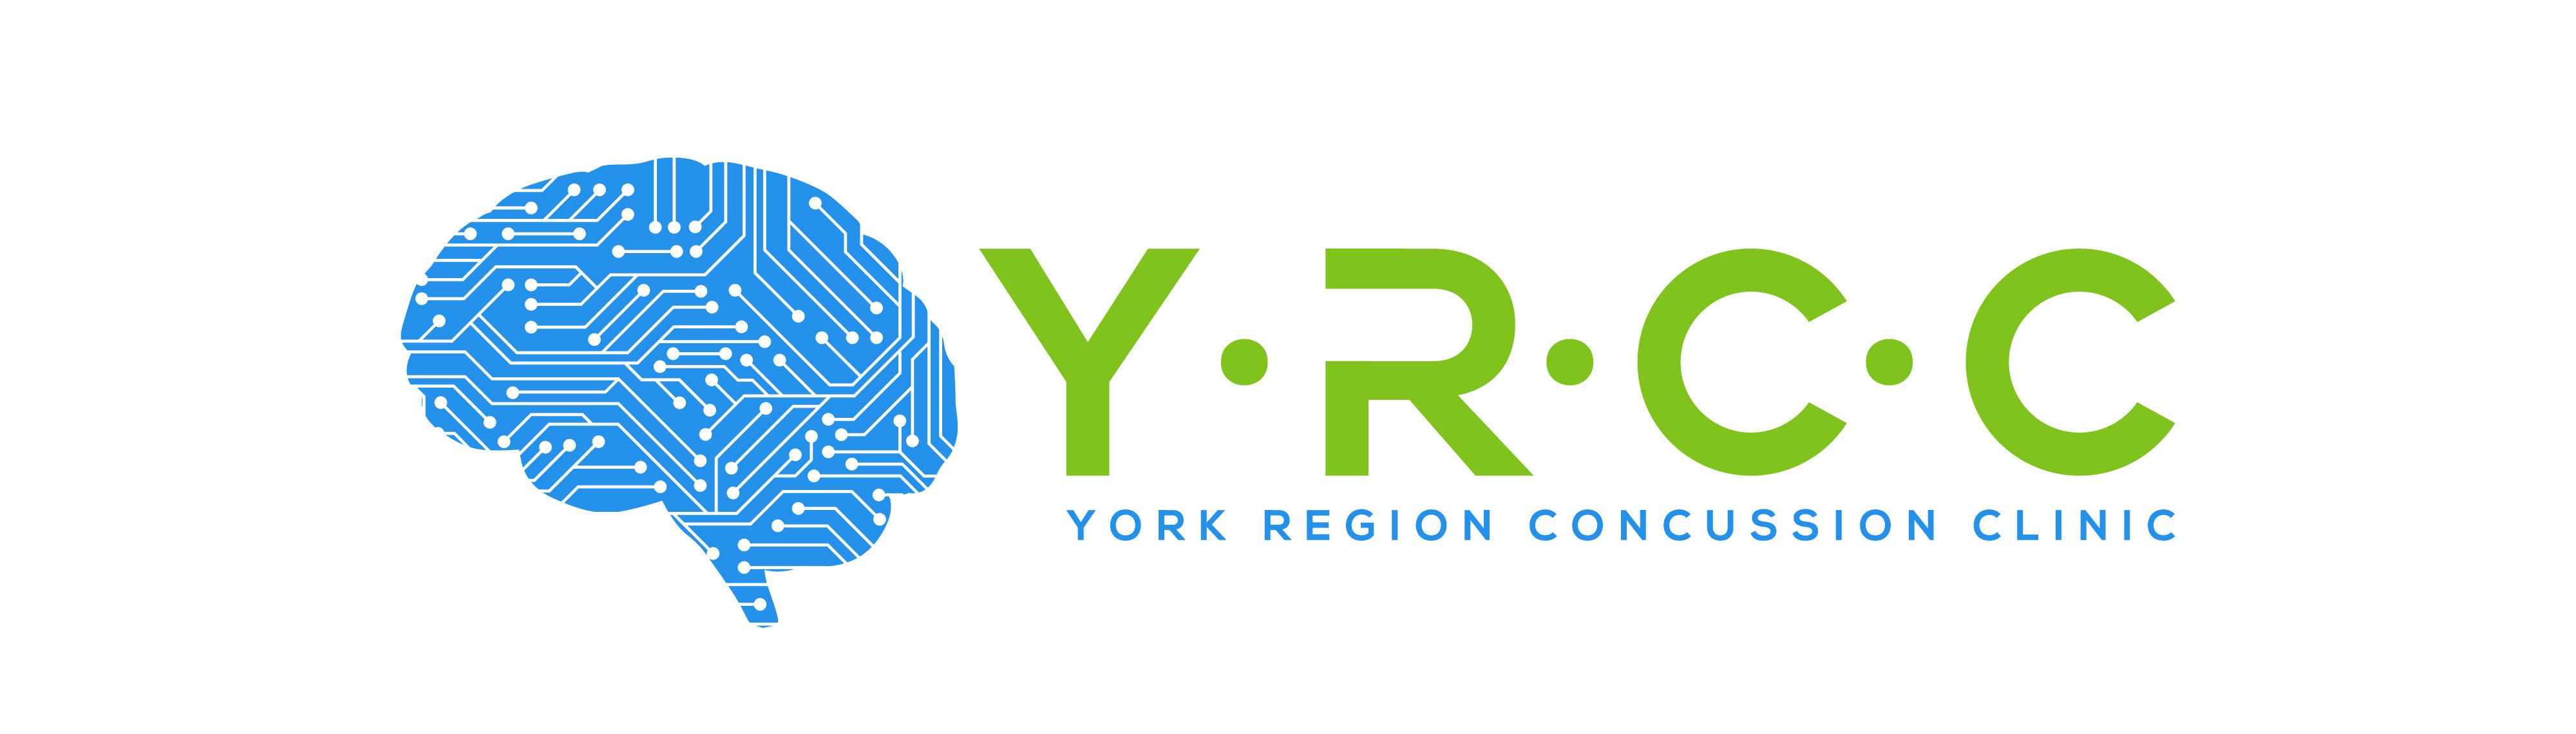 YRCC logo